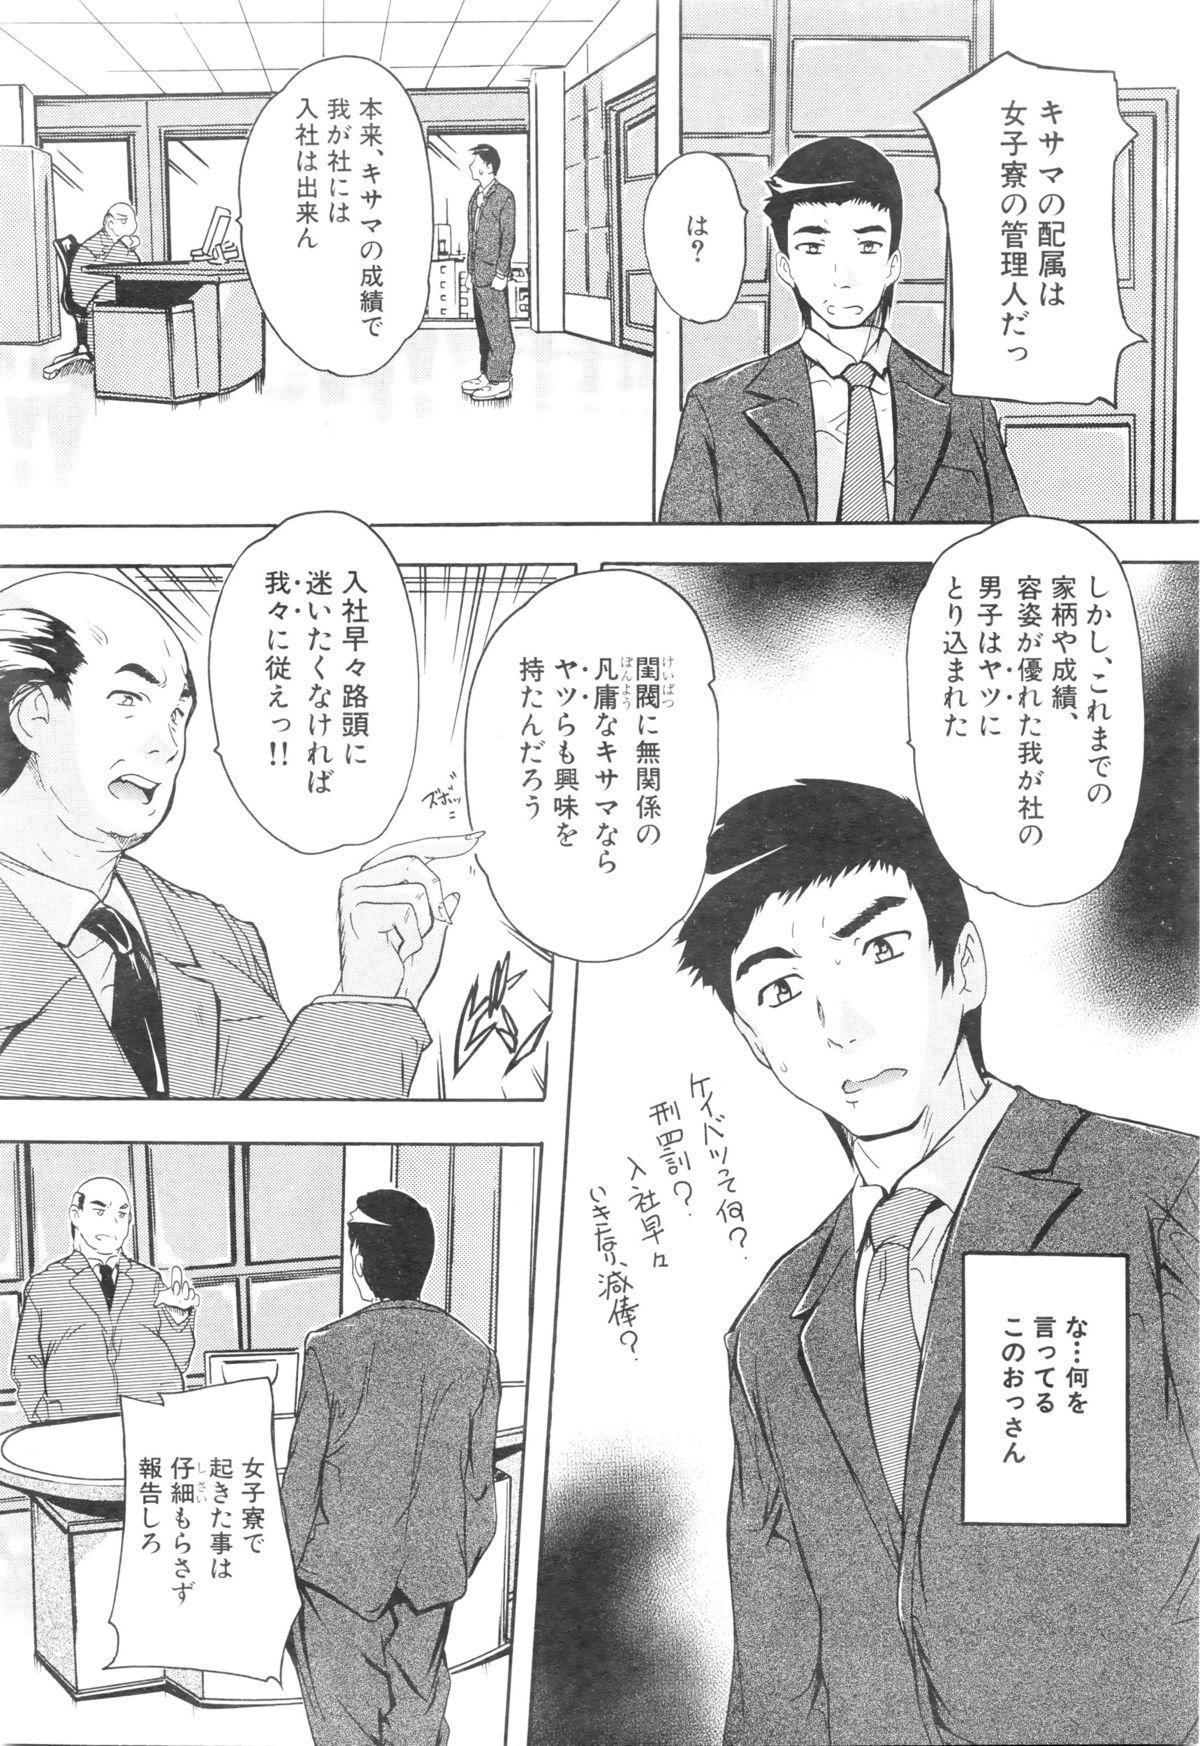 COMIC Mugen Tensei 2016-01 141